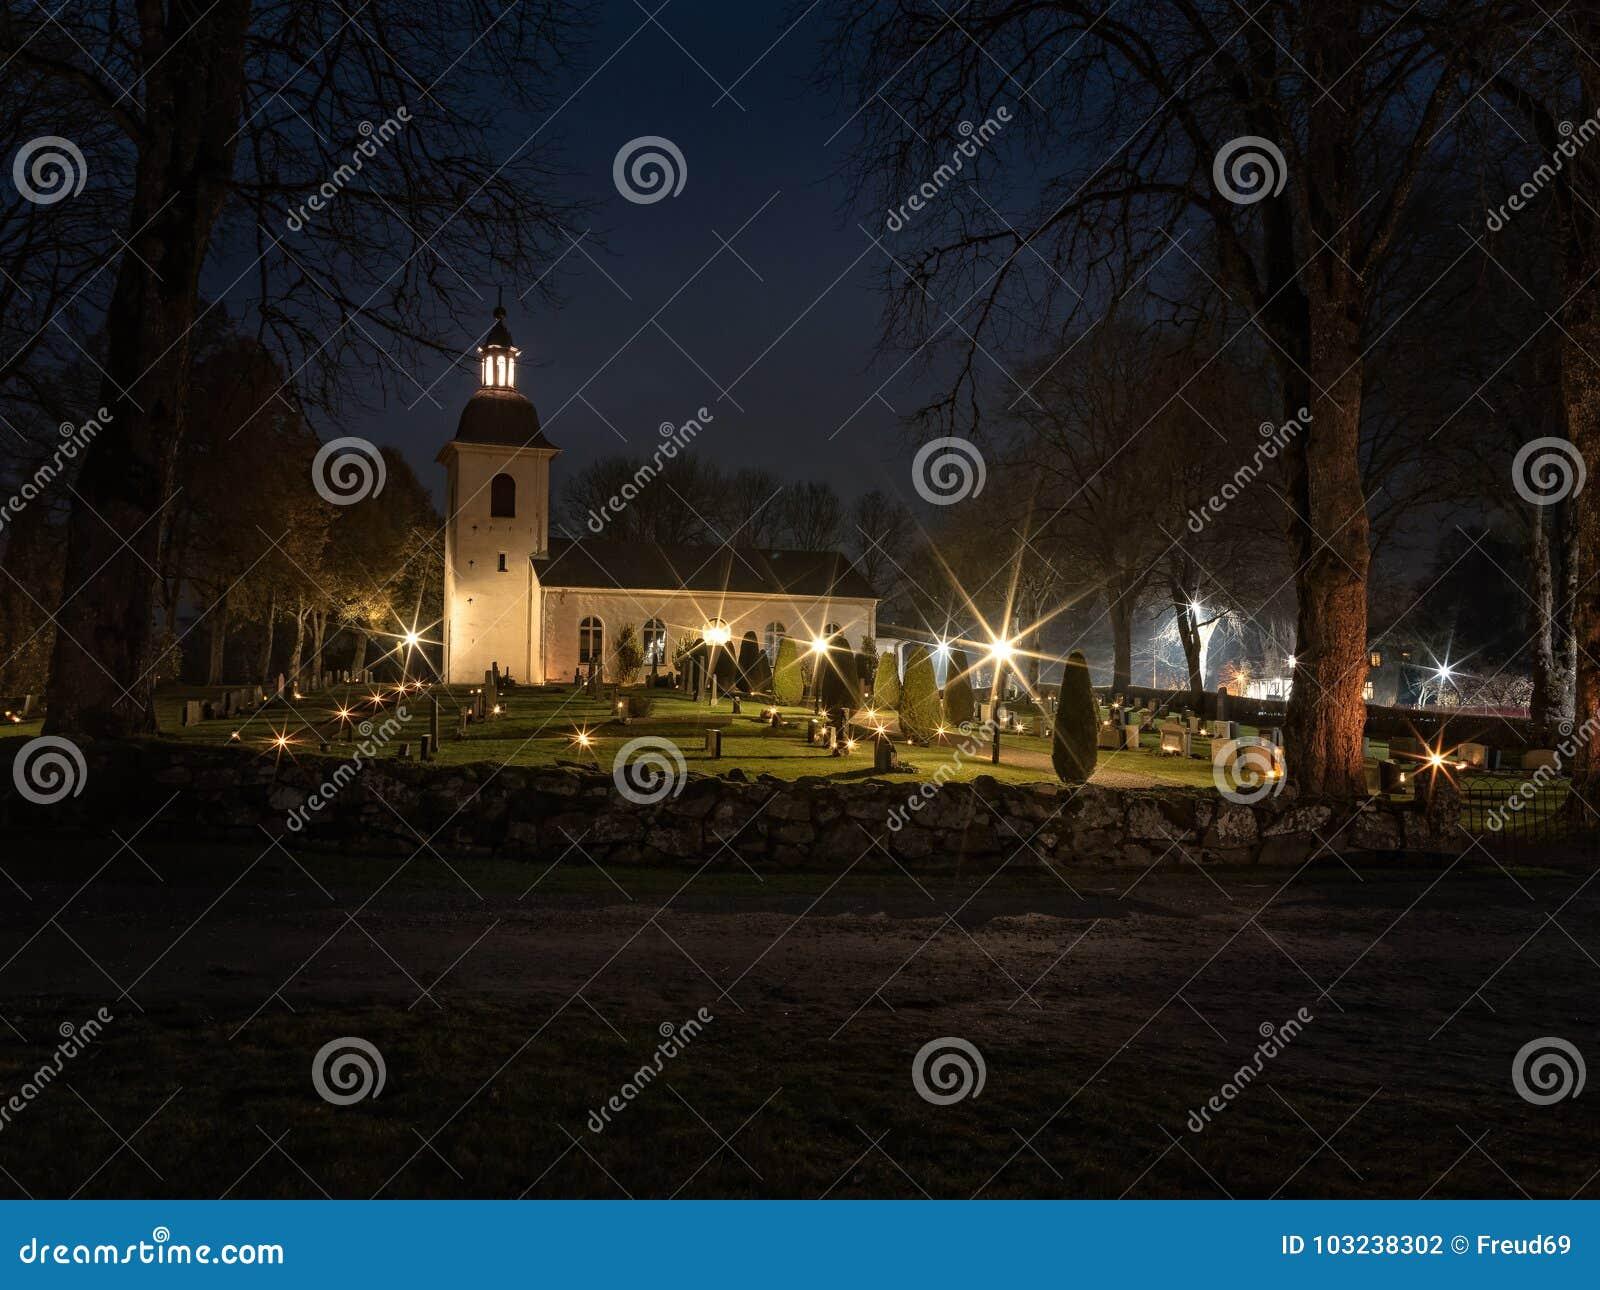 download swedish church at halloween 3 stock photo image of place dark 103238302